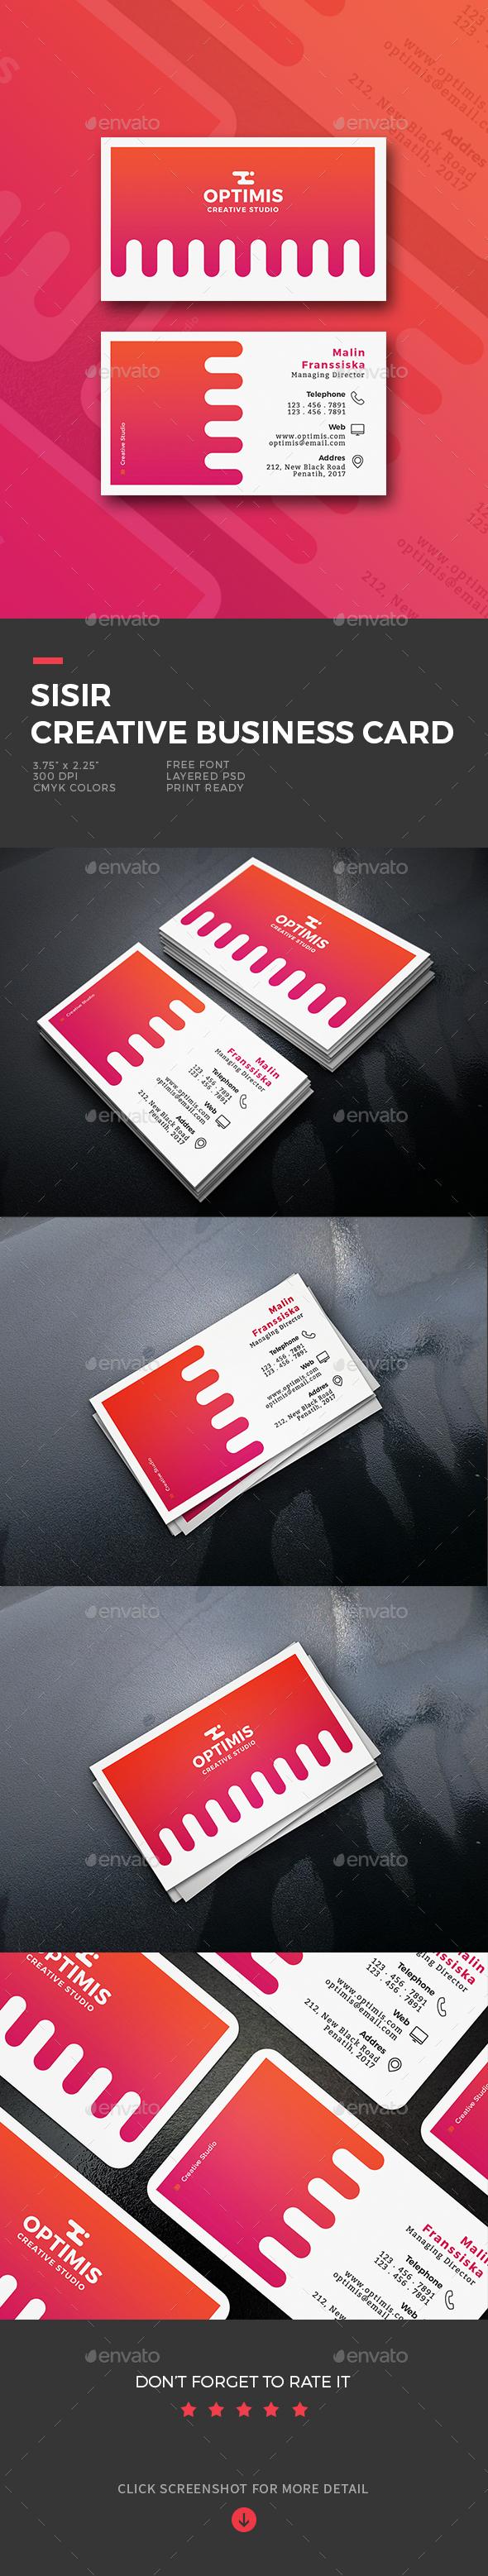 Sisir Creative Business Card - Business Cards Print Templates